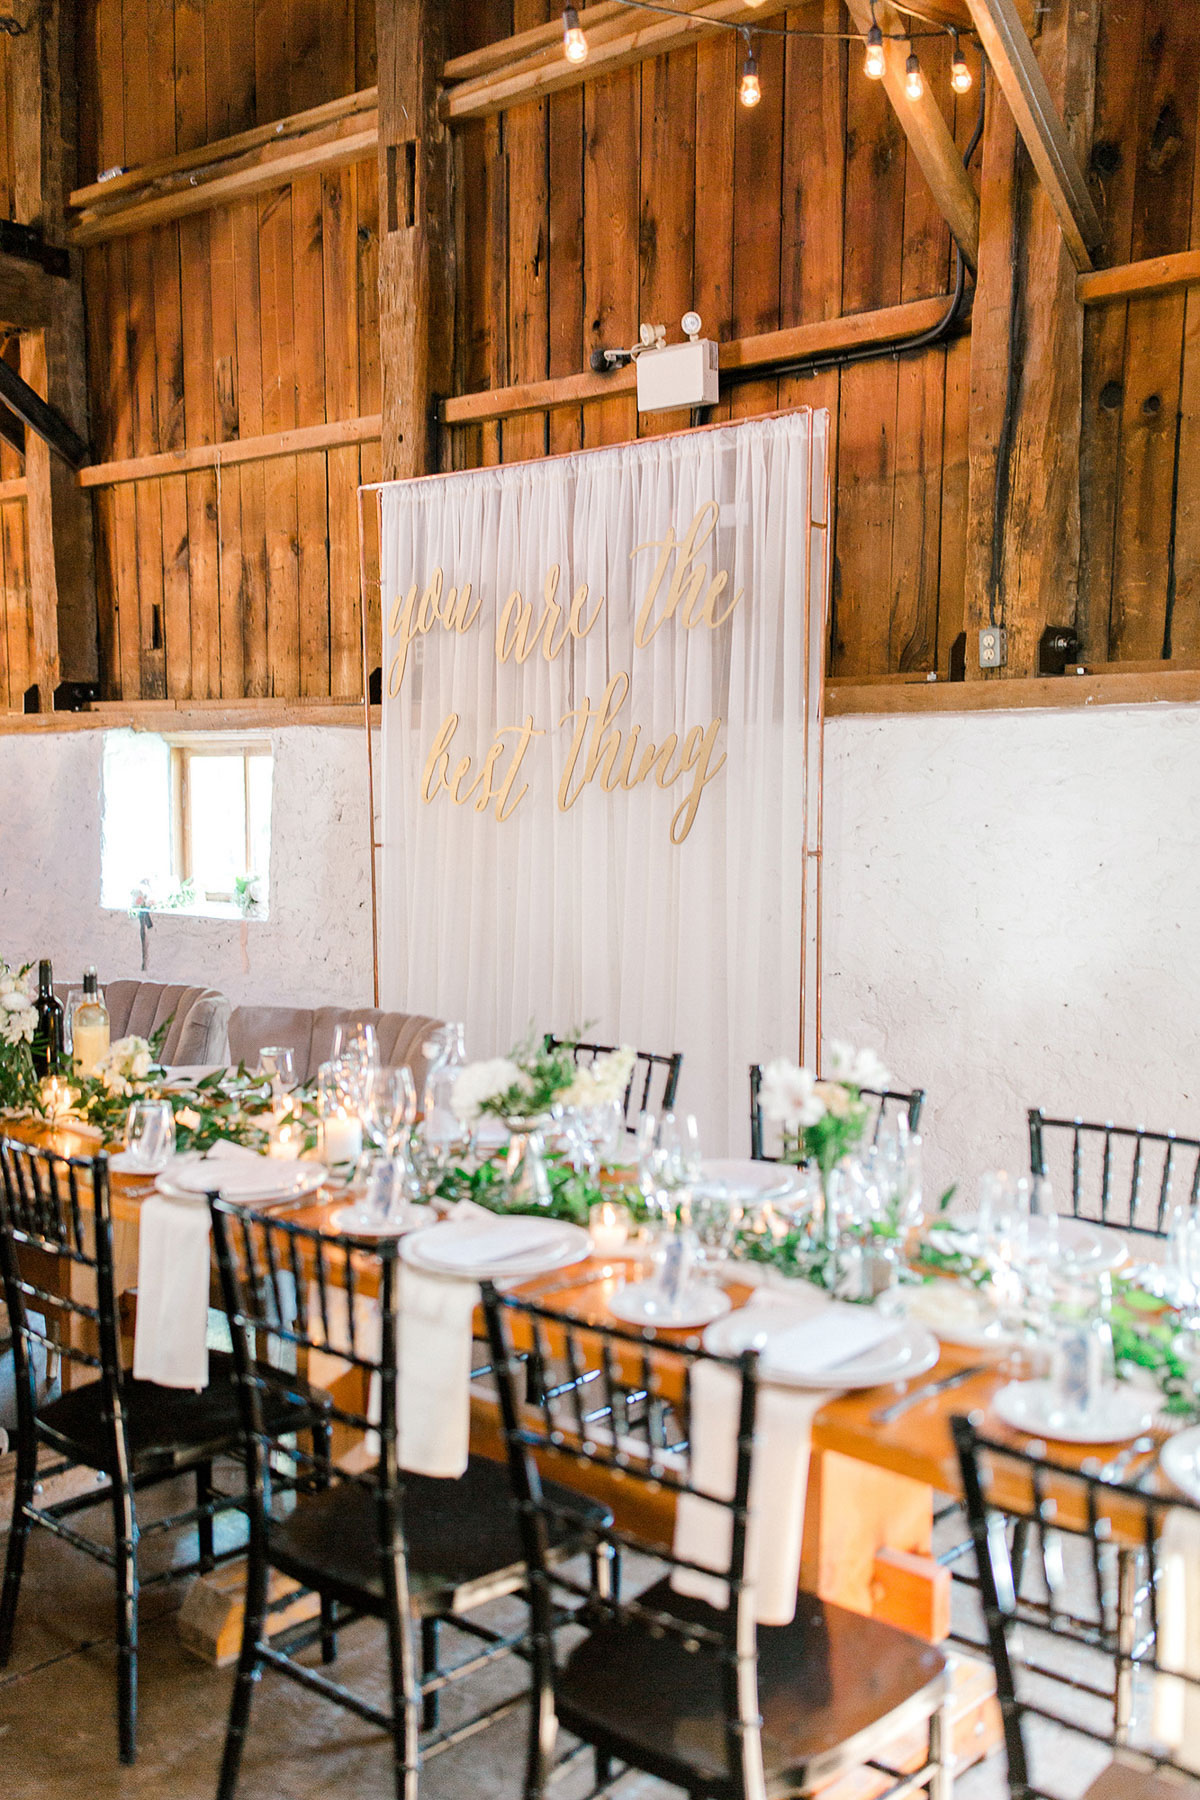 beatrice-elford-photography-vineyard-bride-swish-list-balls-falls-vineland-wedding-65.jpg